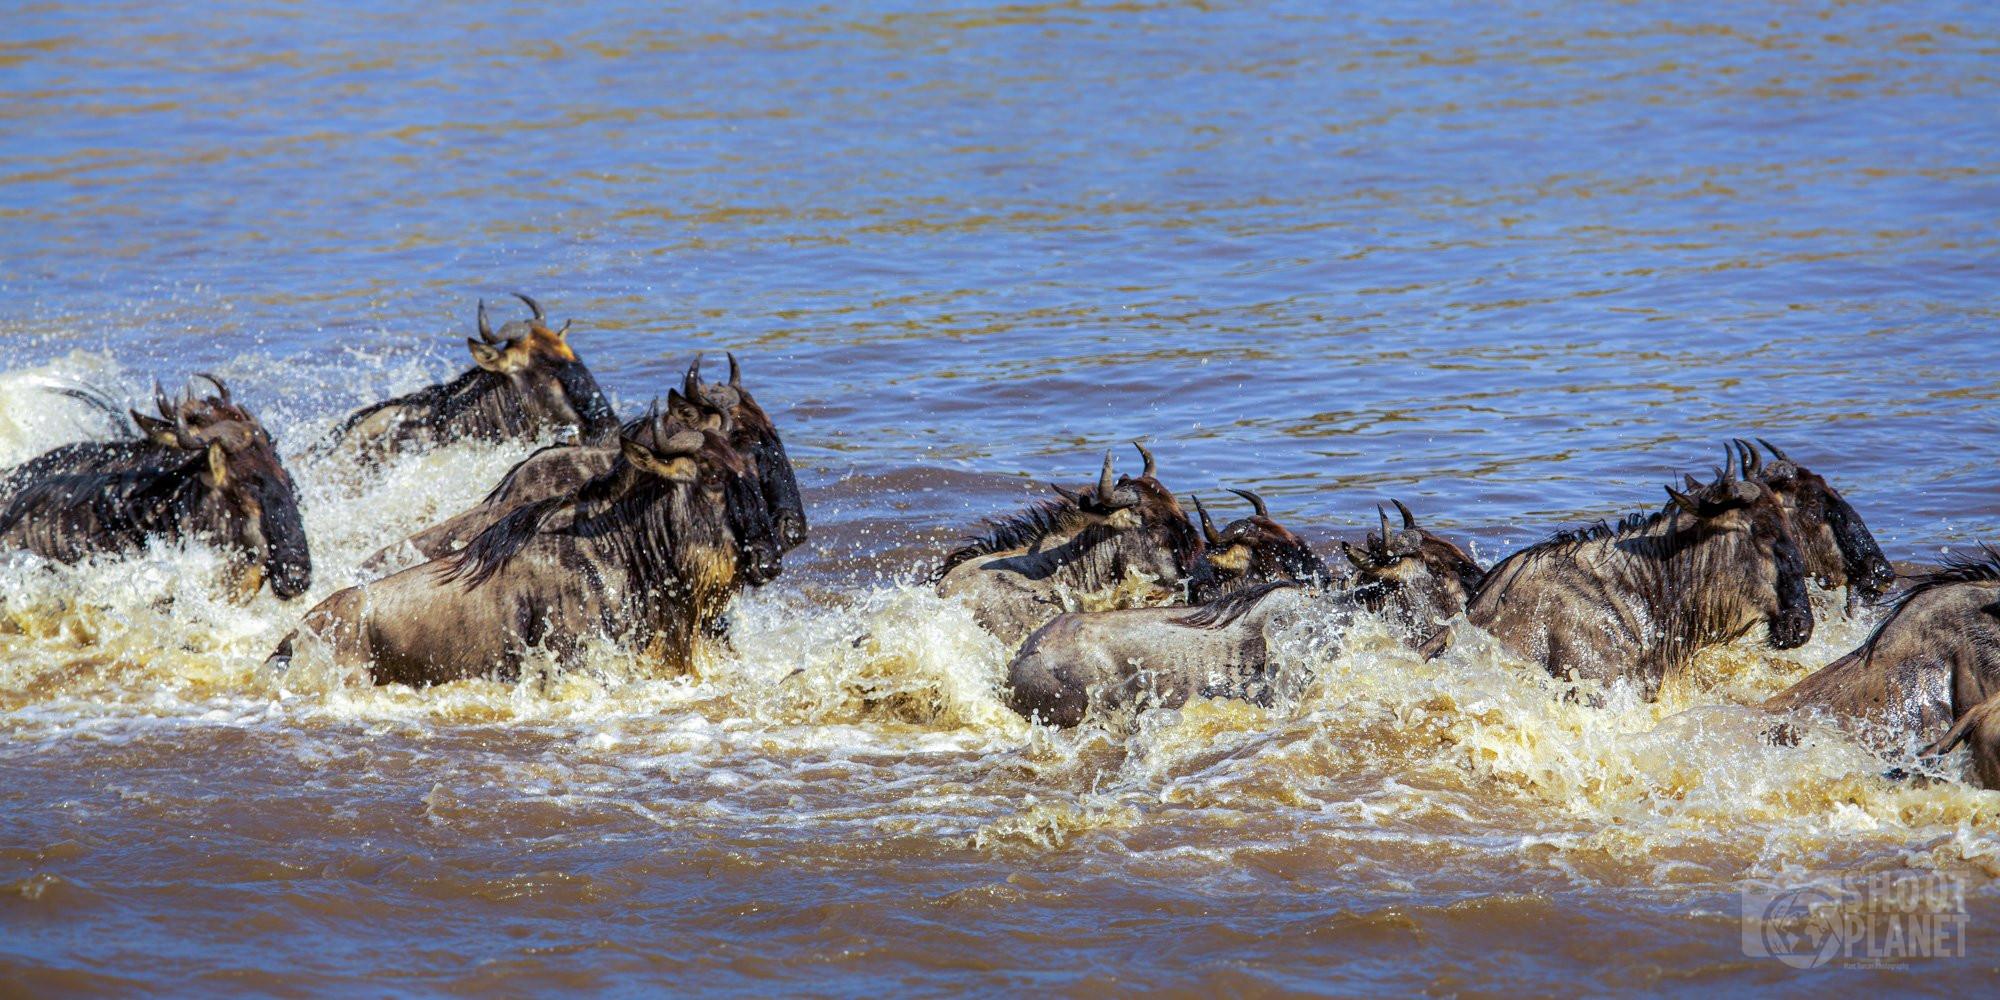 Wildebeest migration, Tanzania and Kenya border, Africa